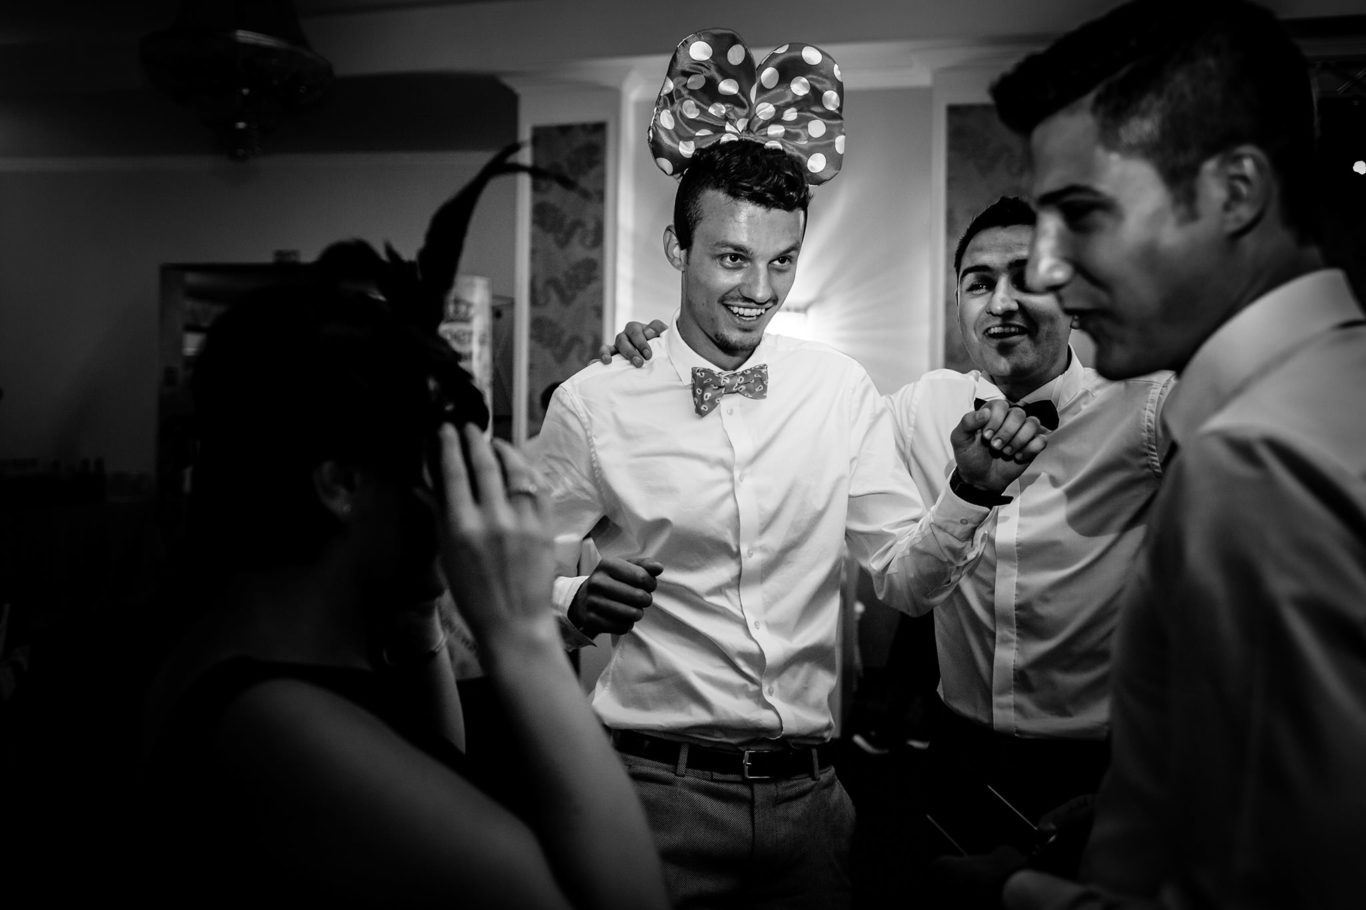 0537-fotografie-nunta-bucuresti-cristina-nicusor-fotograf-ciprian-dumitrescu-dc1_0566